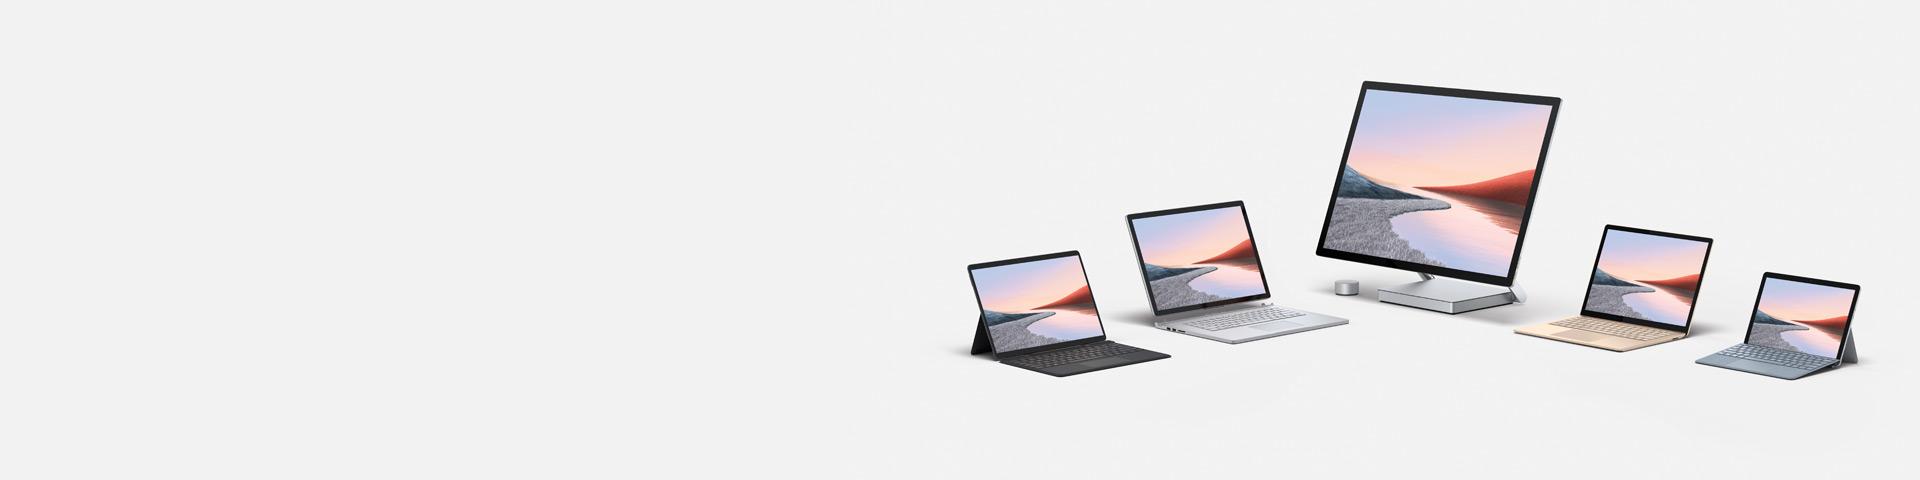 Surfaceコンピュータファミリー